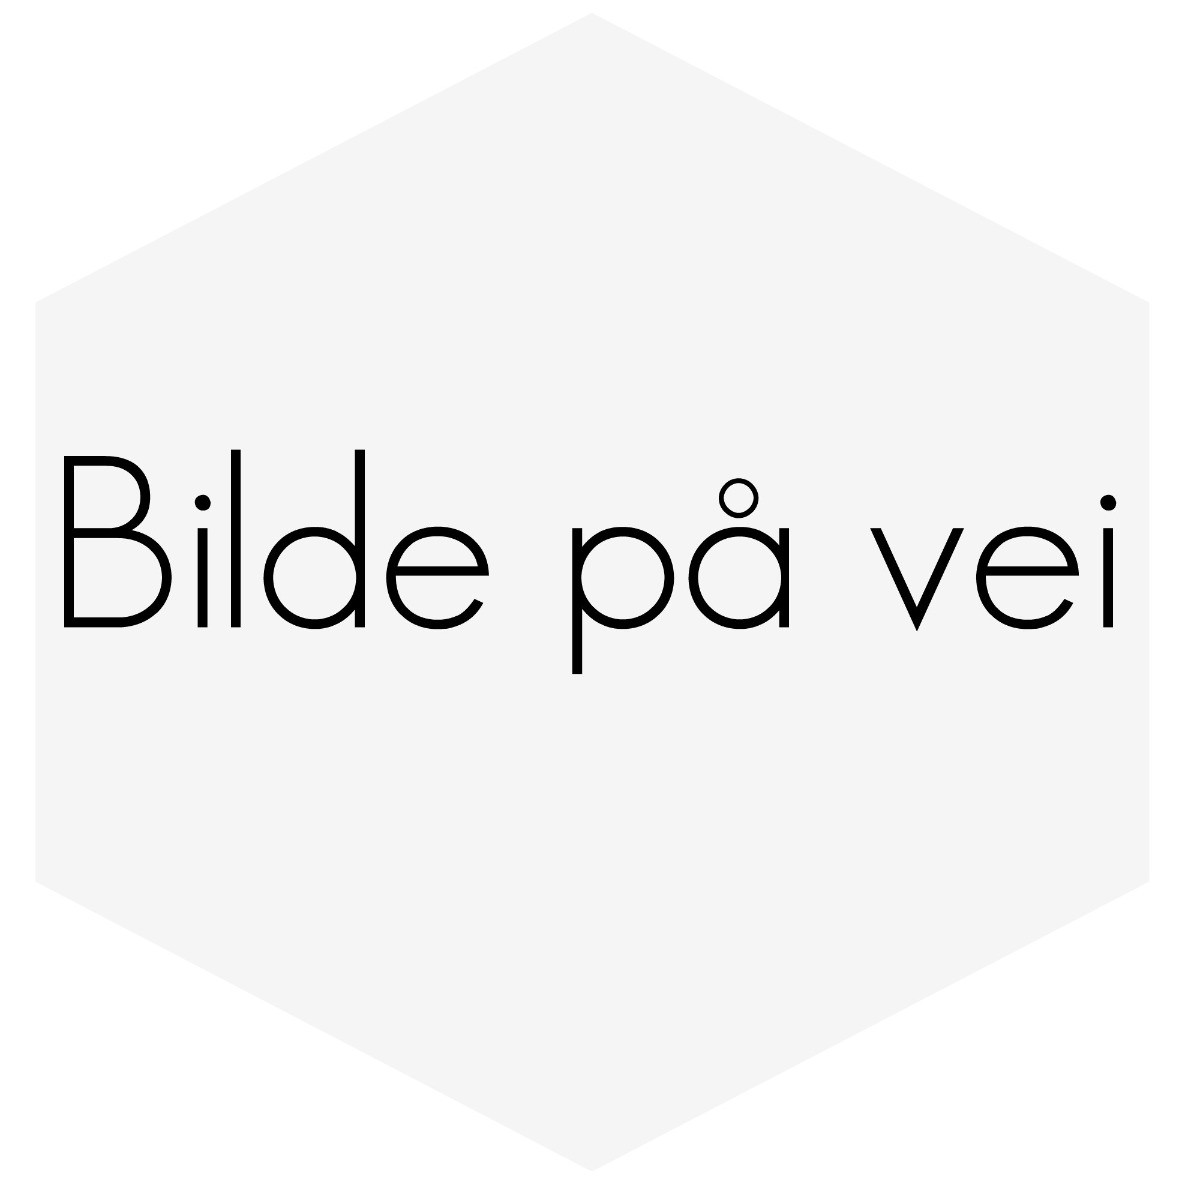 "SILIKONSLANGE DESIMETERVARE BLÅ 3,75"" (95MM)"